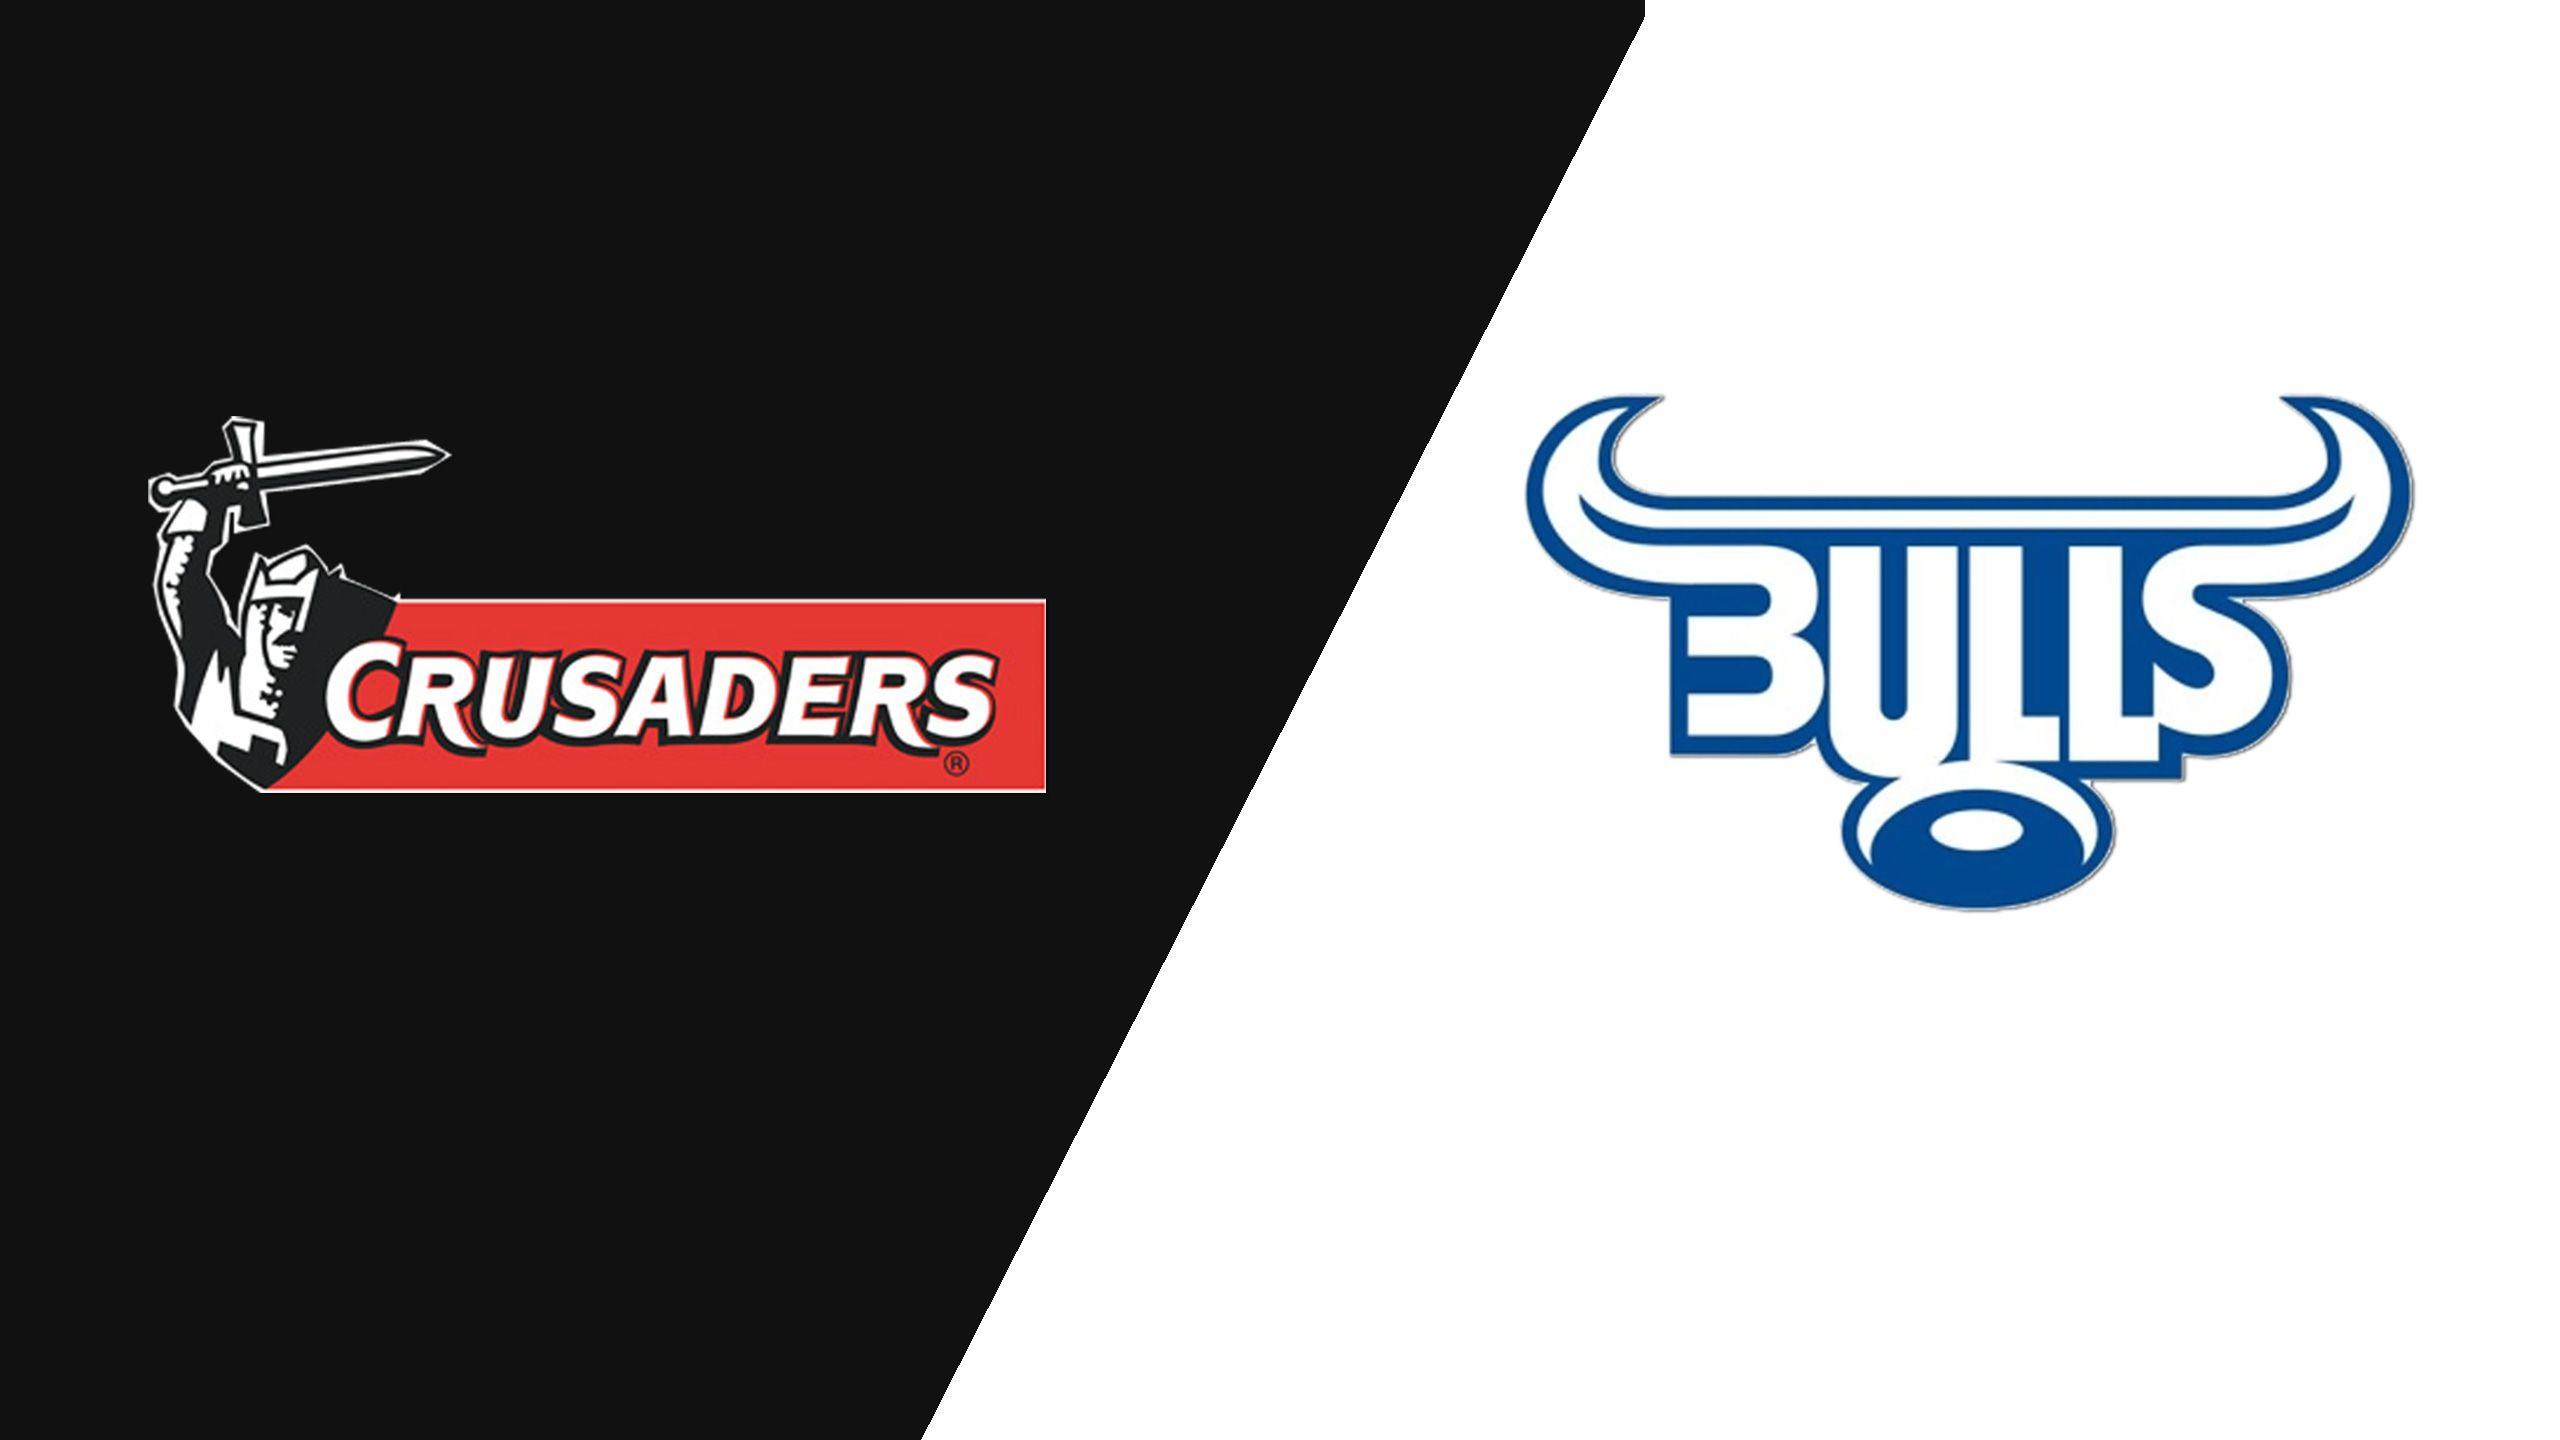 Crusaders vs. Bulls (Super Rugby)